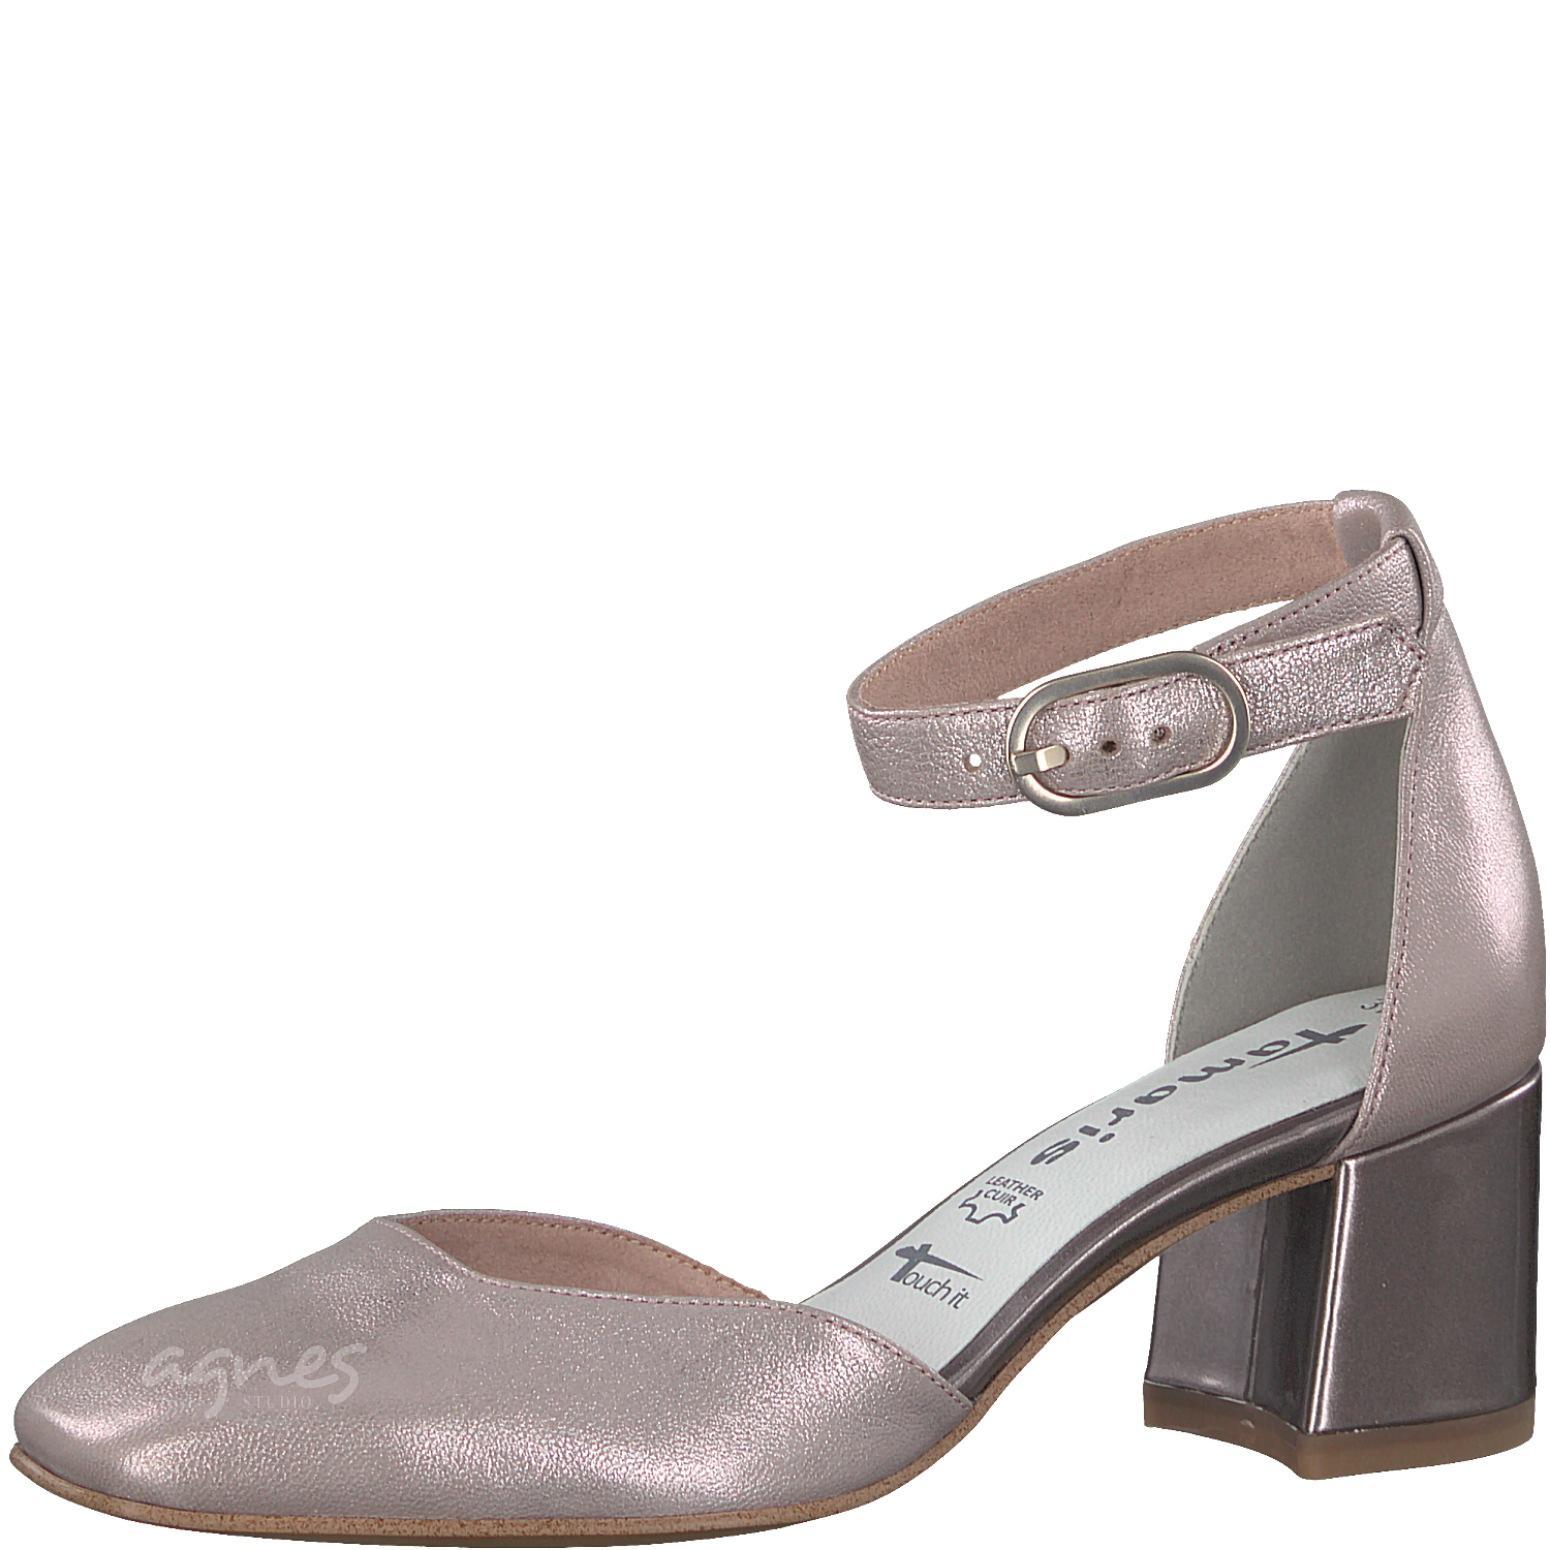 svatebni-obuv-tamaris-24425-studioagnes